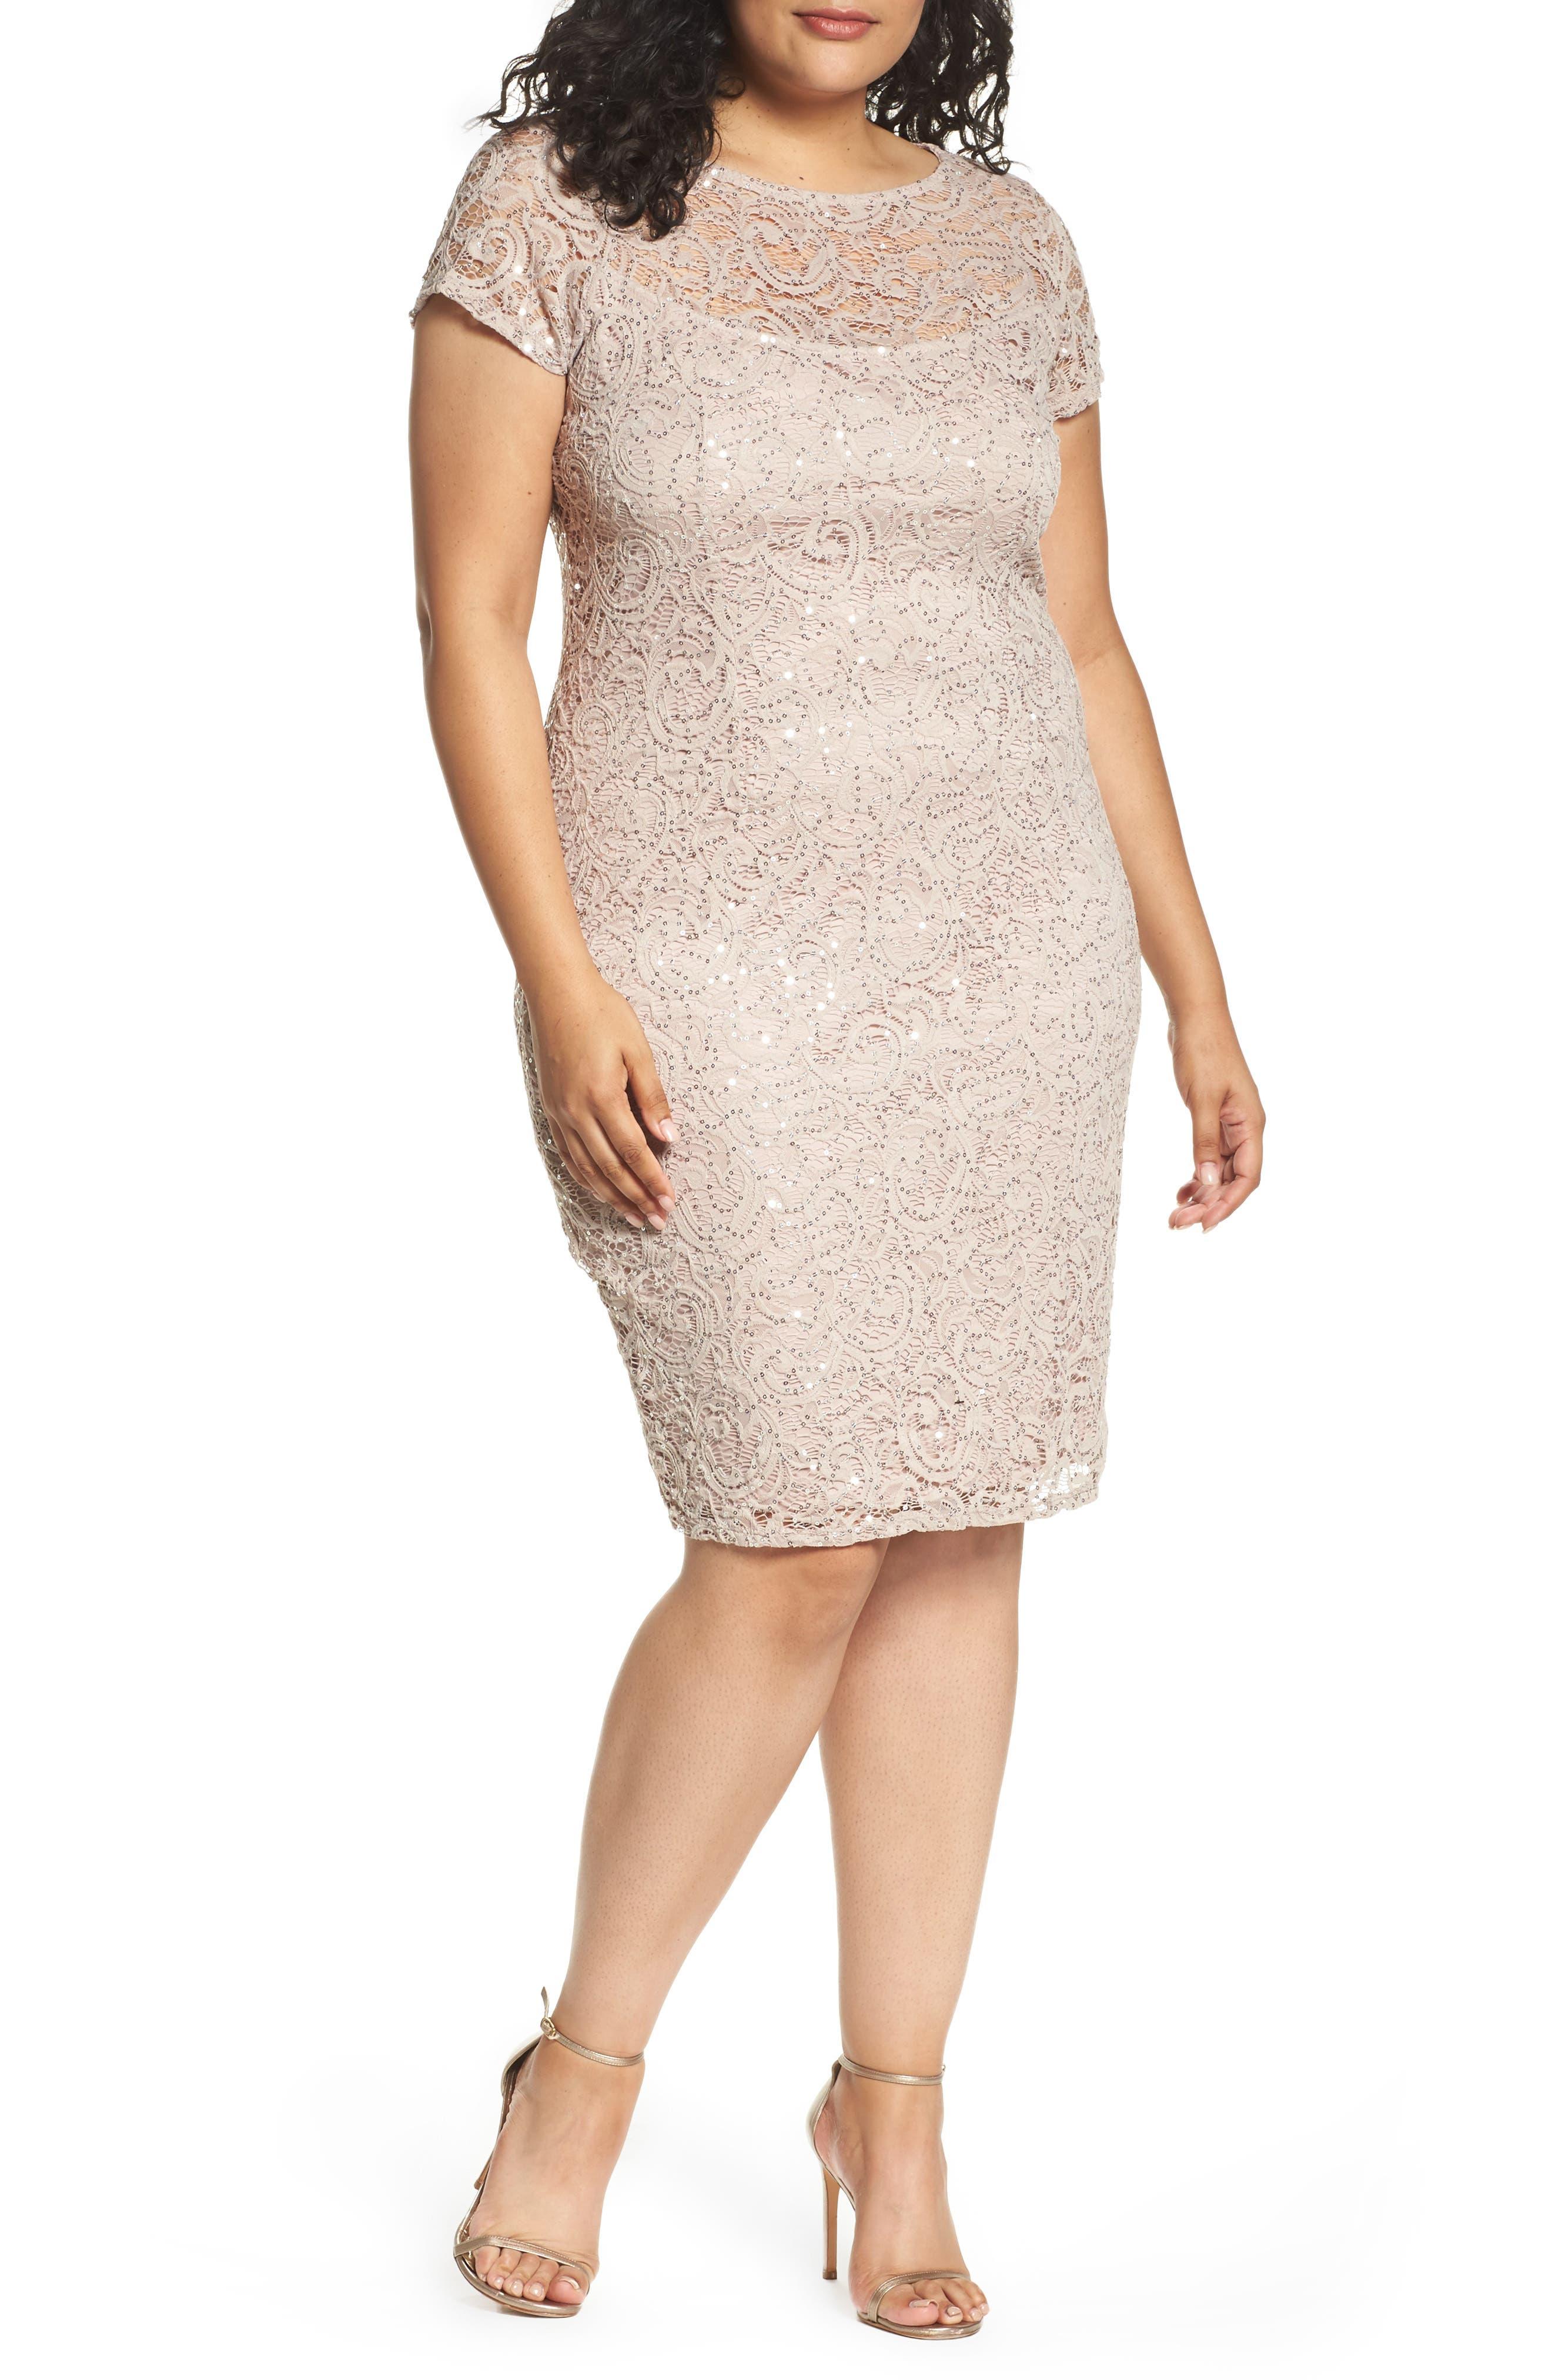 Marina Sequin Lace Sheath Dress (Plus Size)